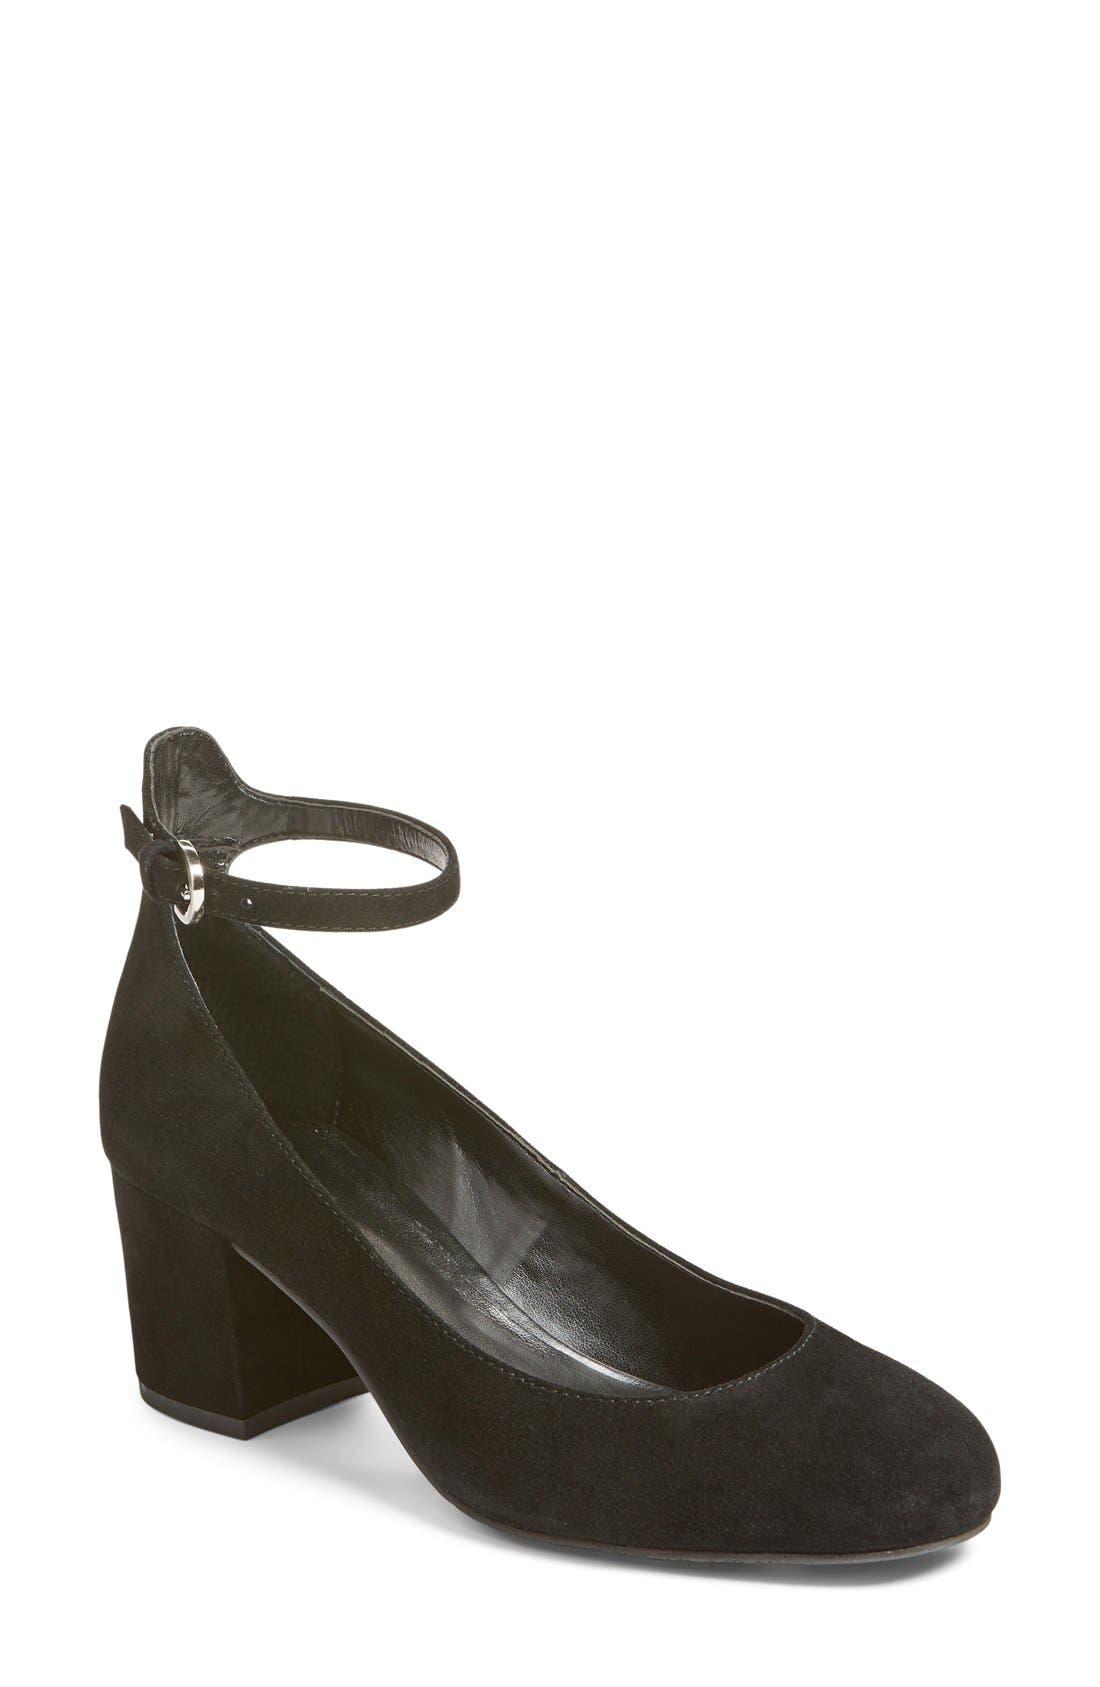 Main Image - BP. Ankle Strap Block Heel Pump (Women)